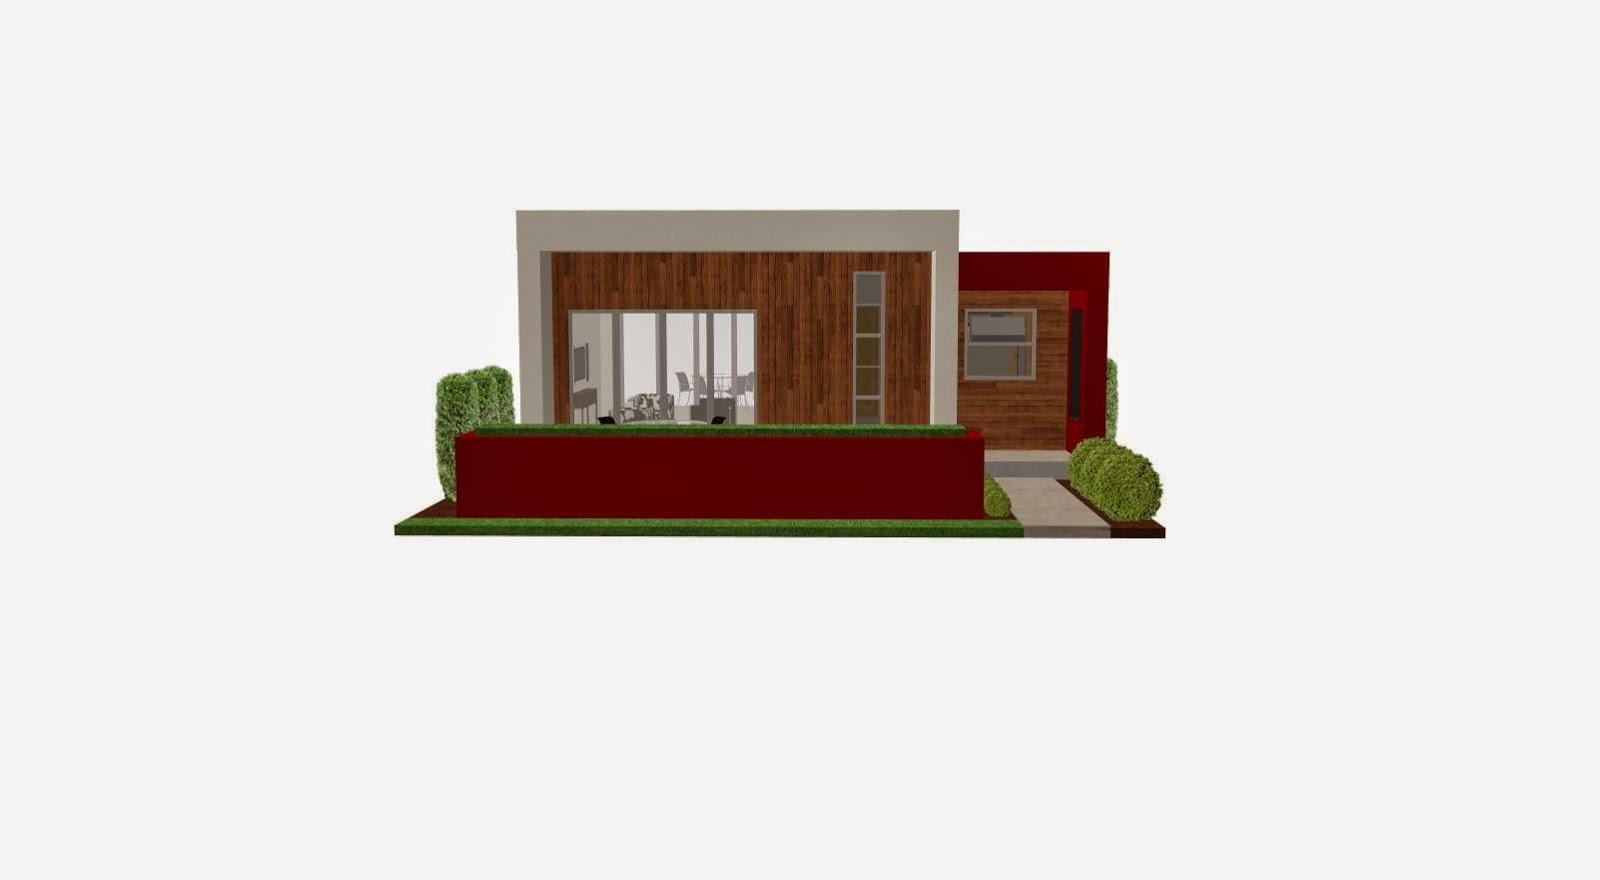 http://mini-engineer.blogspot.com/2014/08/contemporary-plan-one-story-home-house.html